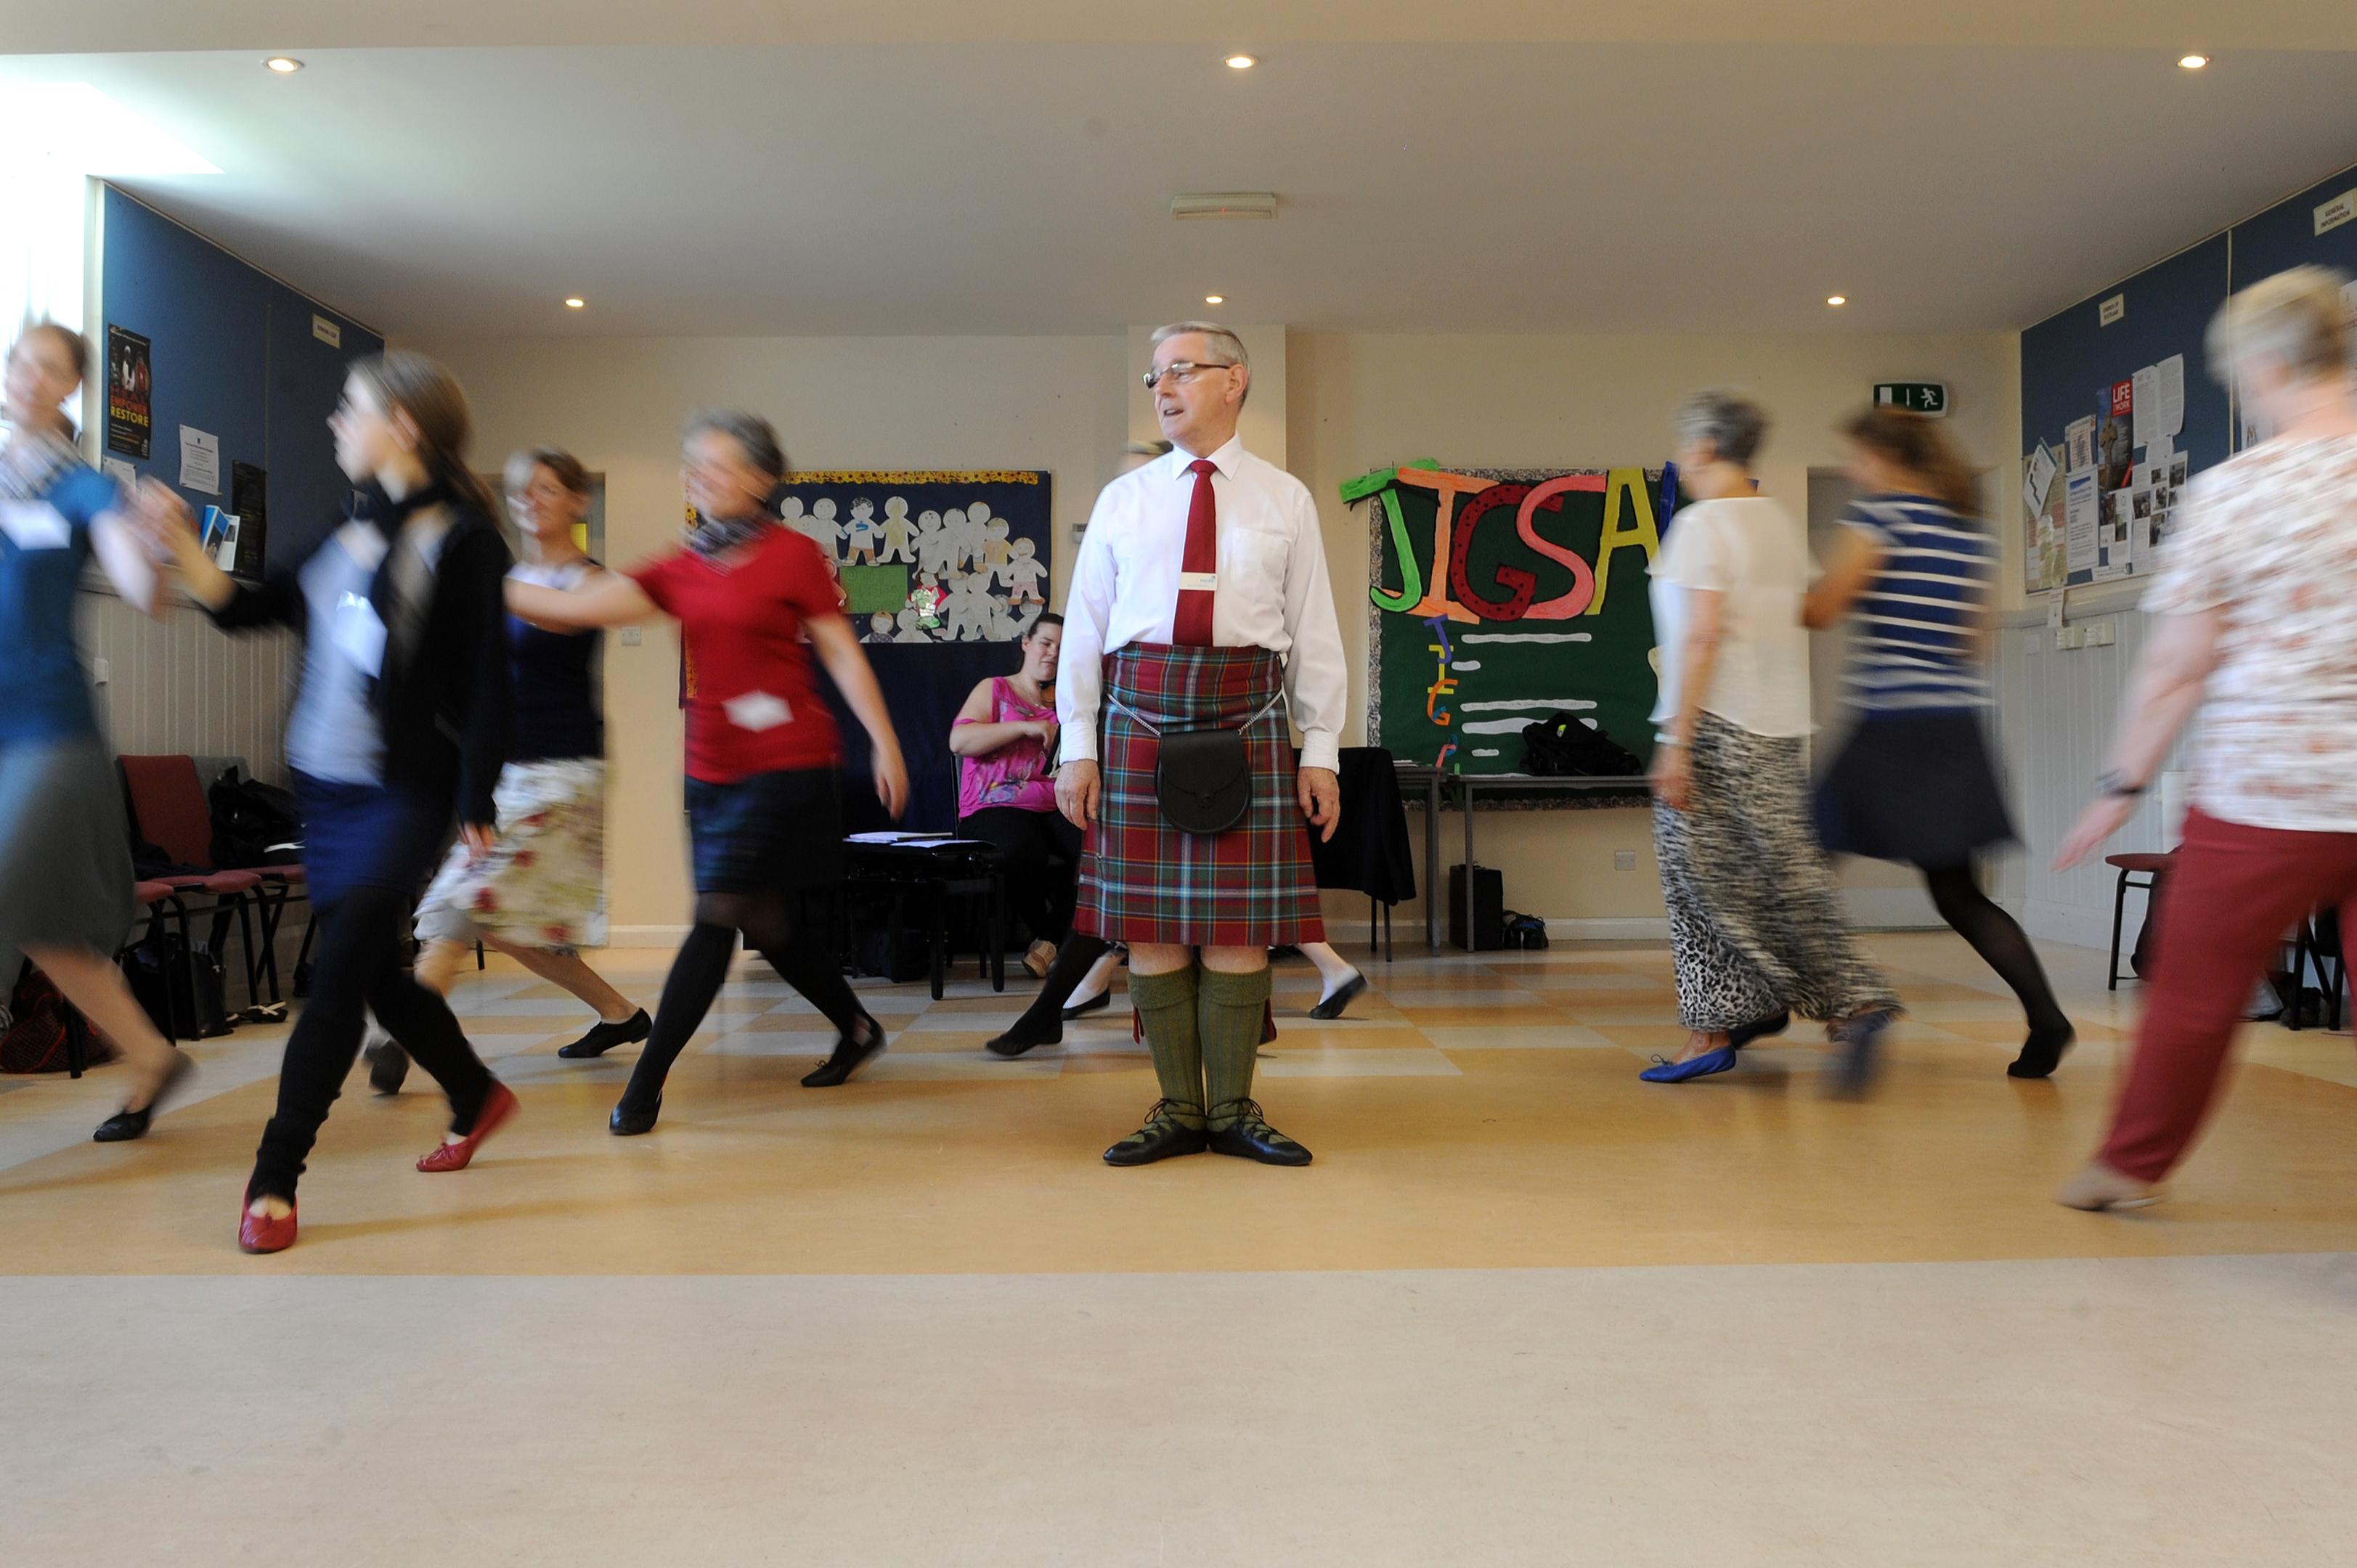 s; John Wilkinson instructing a dance class with violinist, Shona MacFadyen,